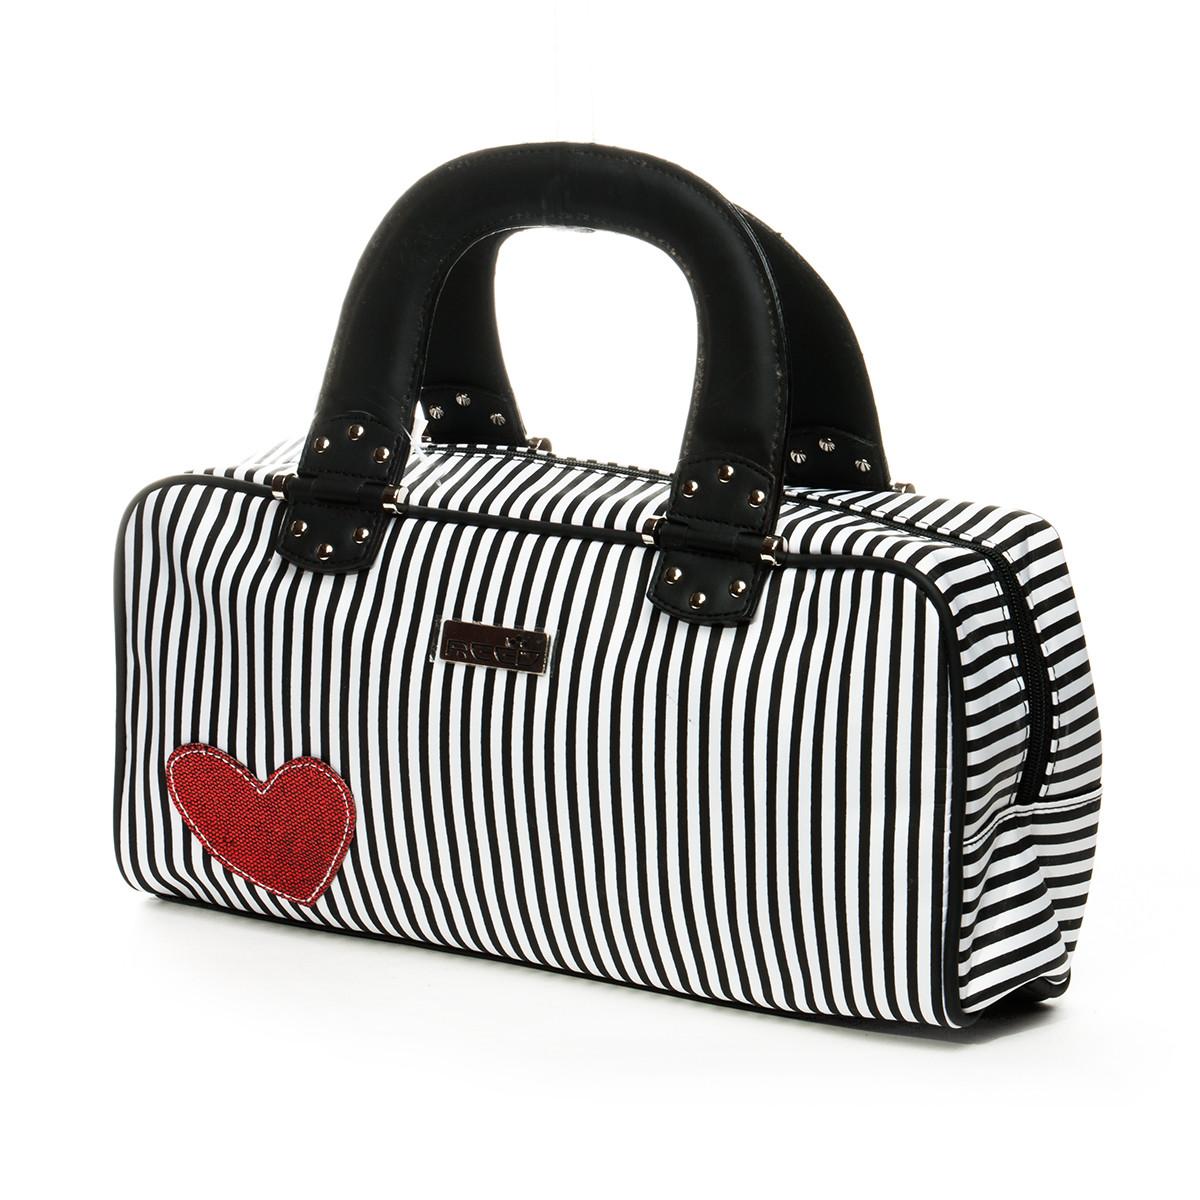 21c9328236f4 Косметичка Reed Red heart 7848, цена 405 грн., купить Одесса — Prom ...